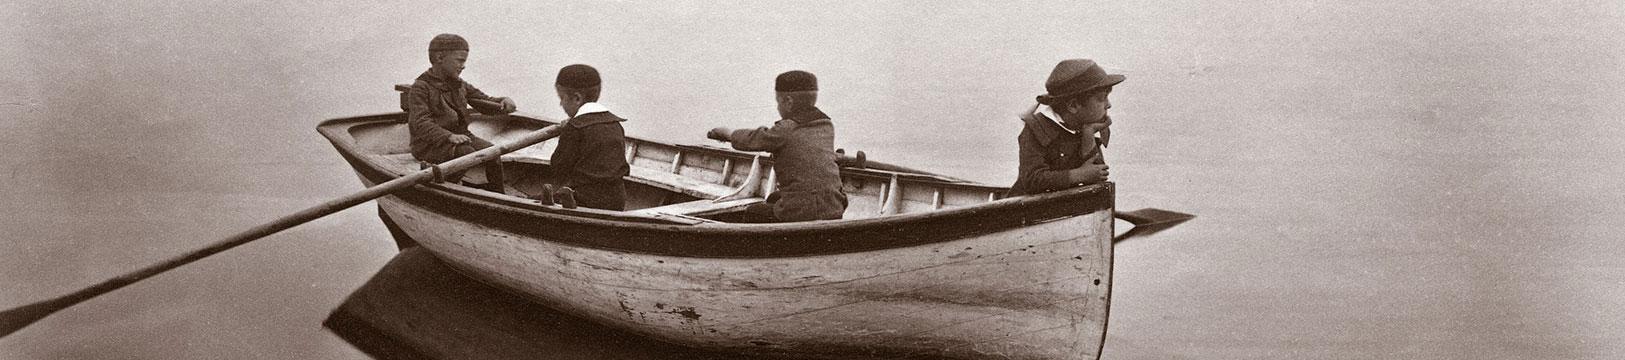 The Mariners, Upper Saranac Lake